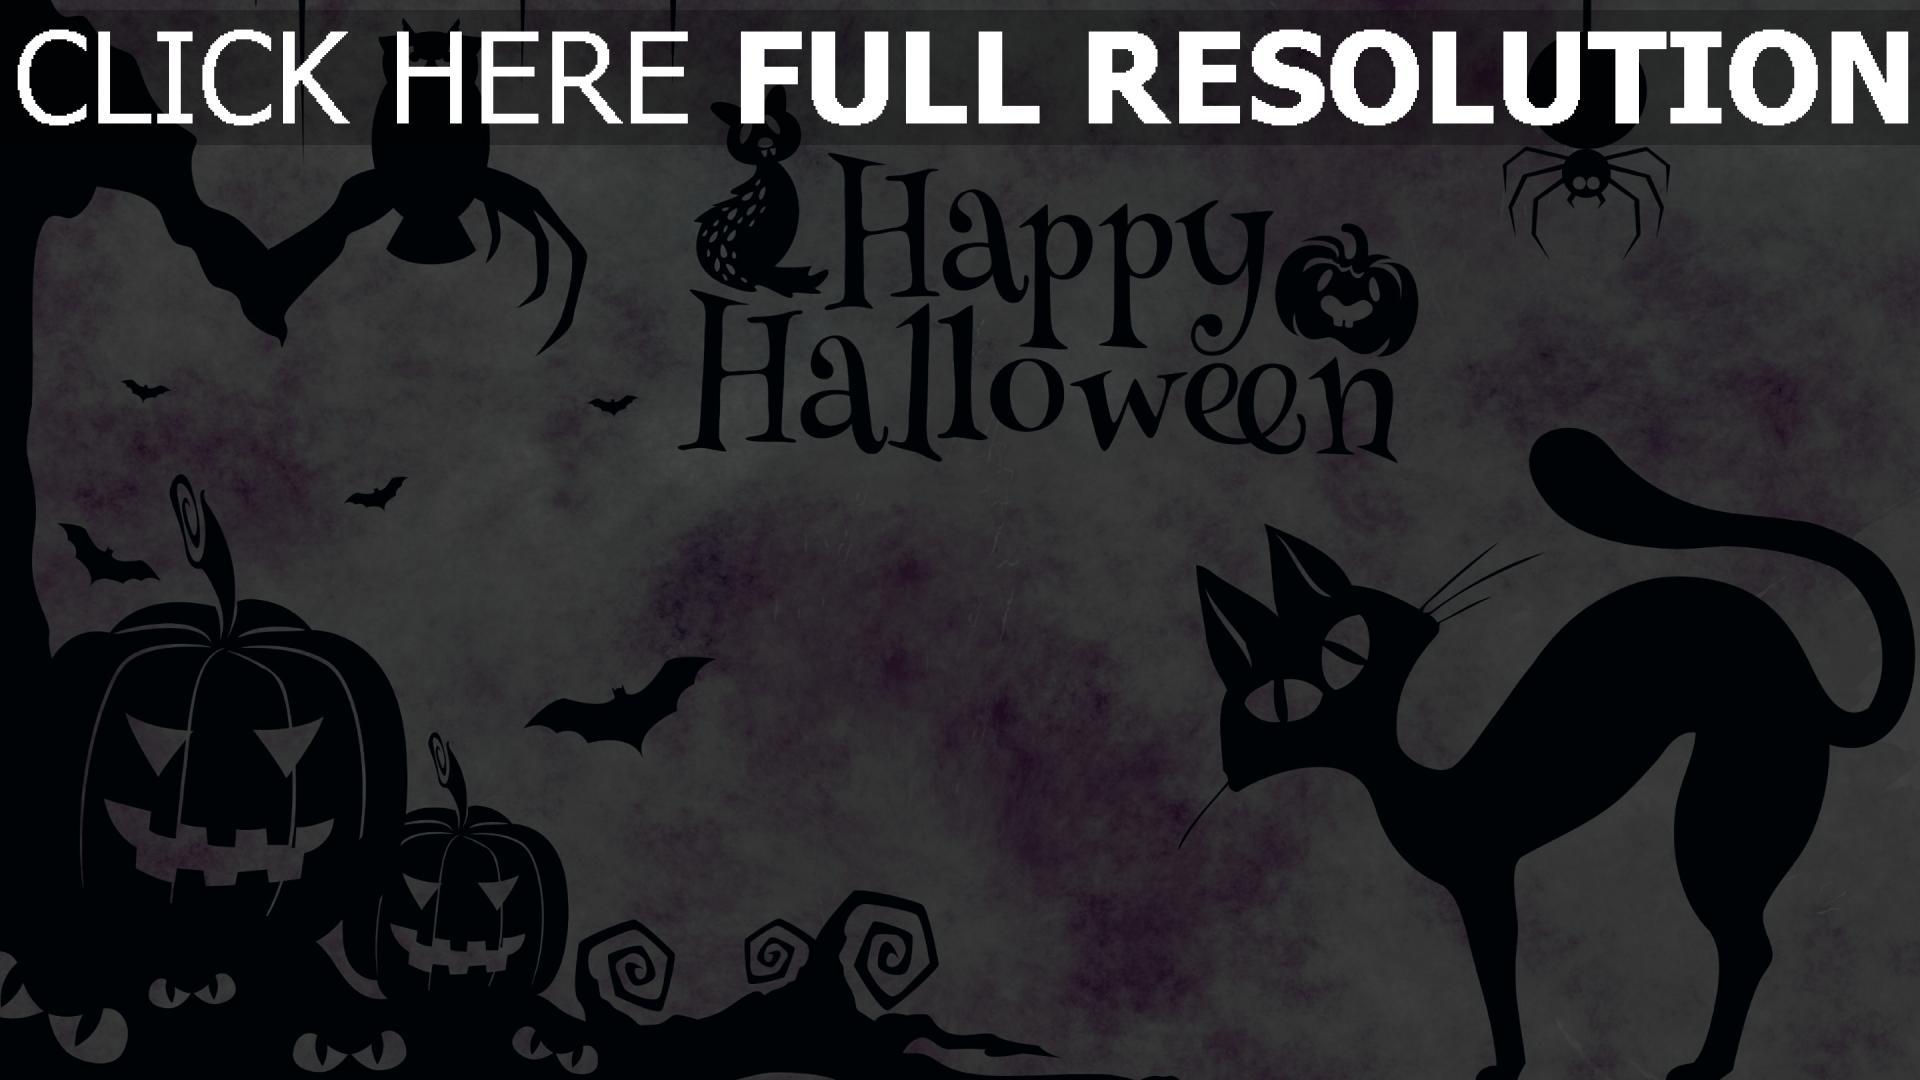 hd hintergrundbilder minimalismus spinne jack-o-latern eule halloween katze 1920x1080